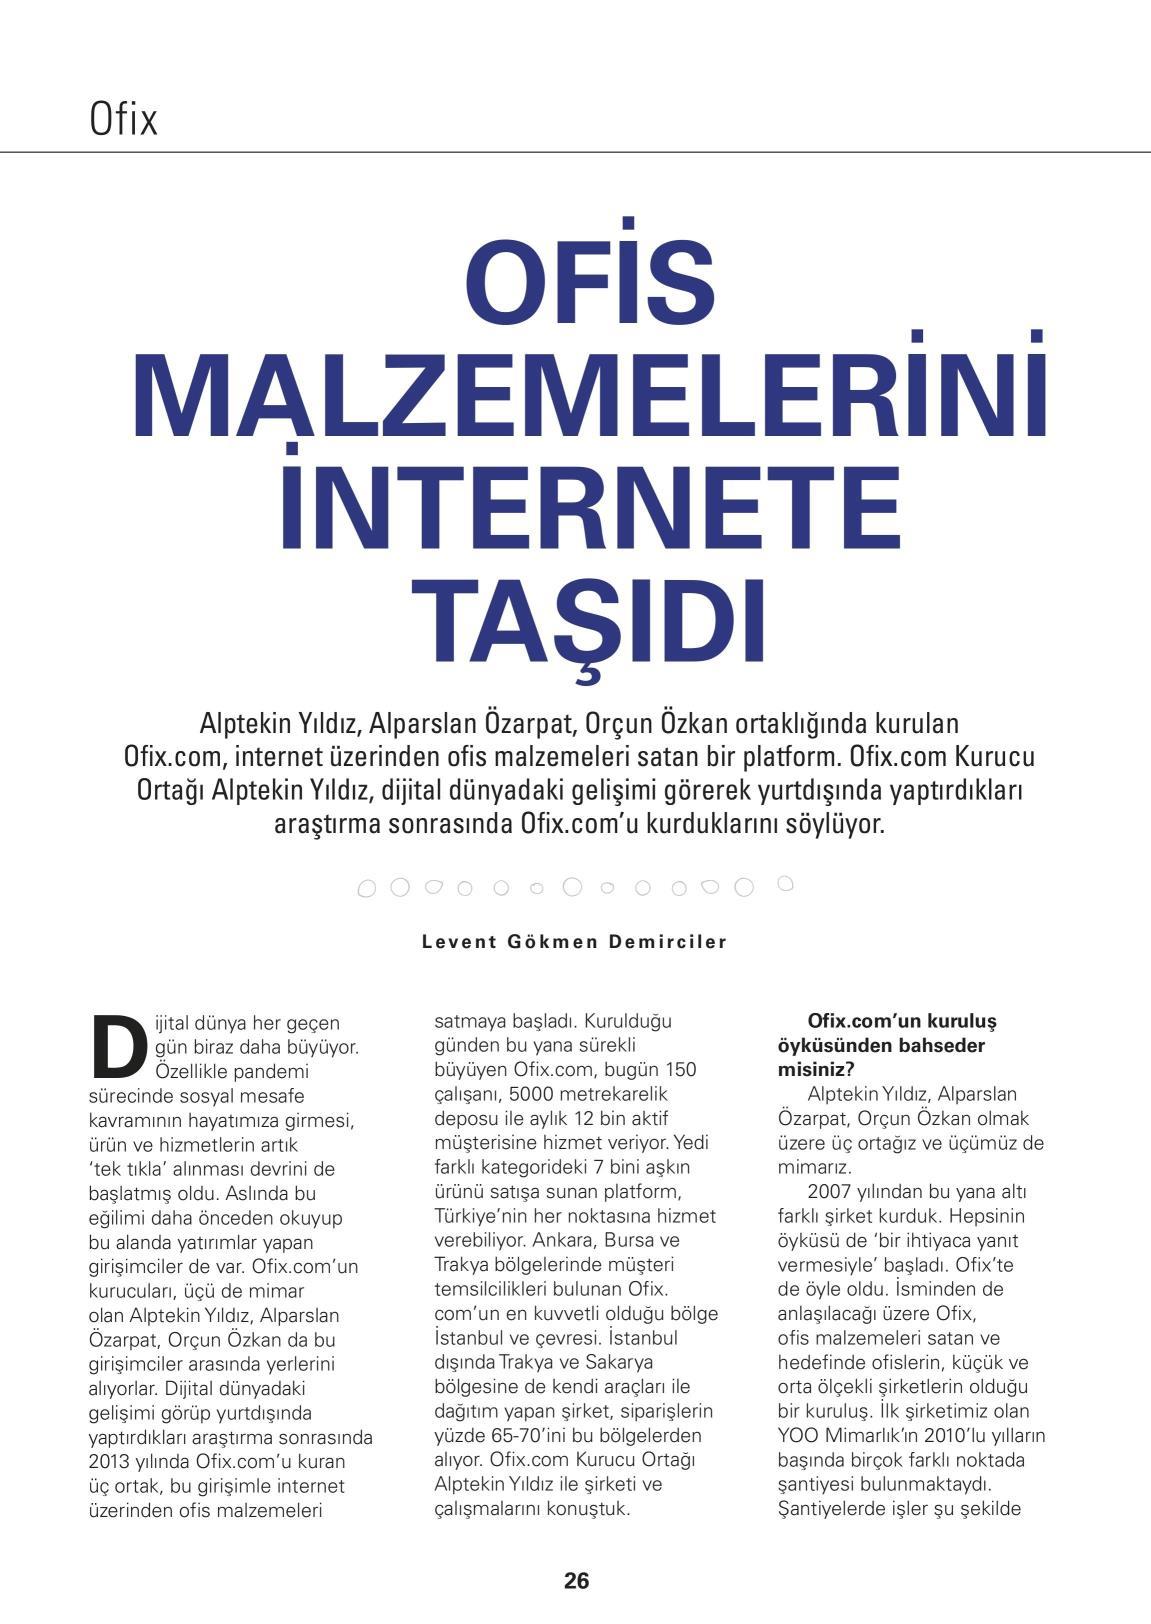 EKONOMİST / OFİX.COM